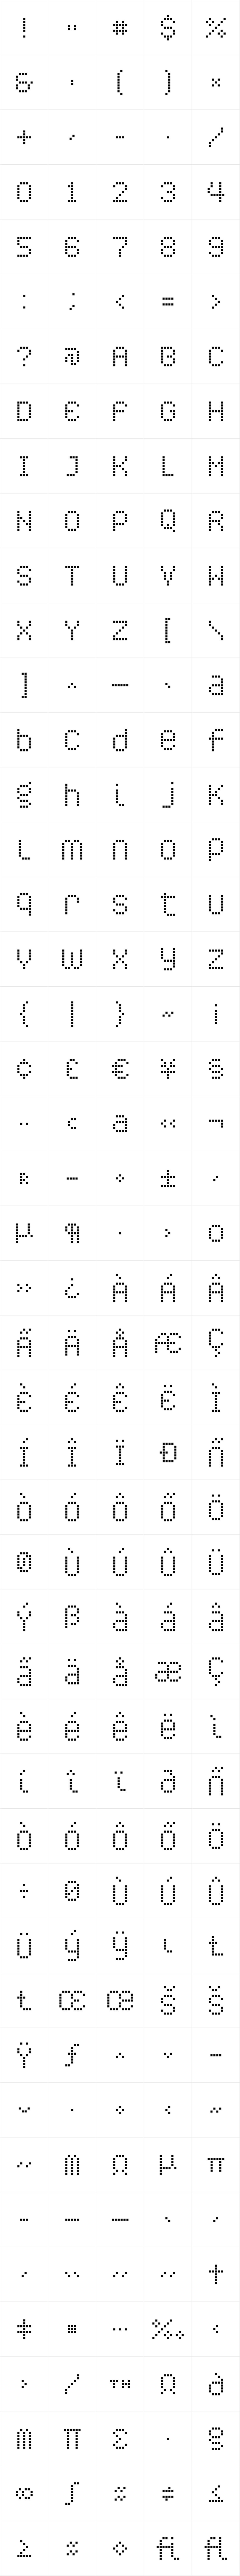 YWFT Caliper Regular Cubed